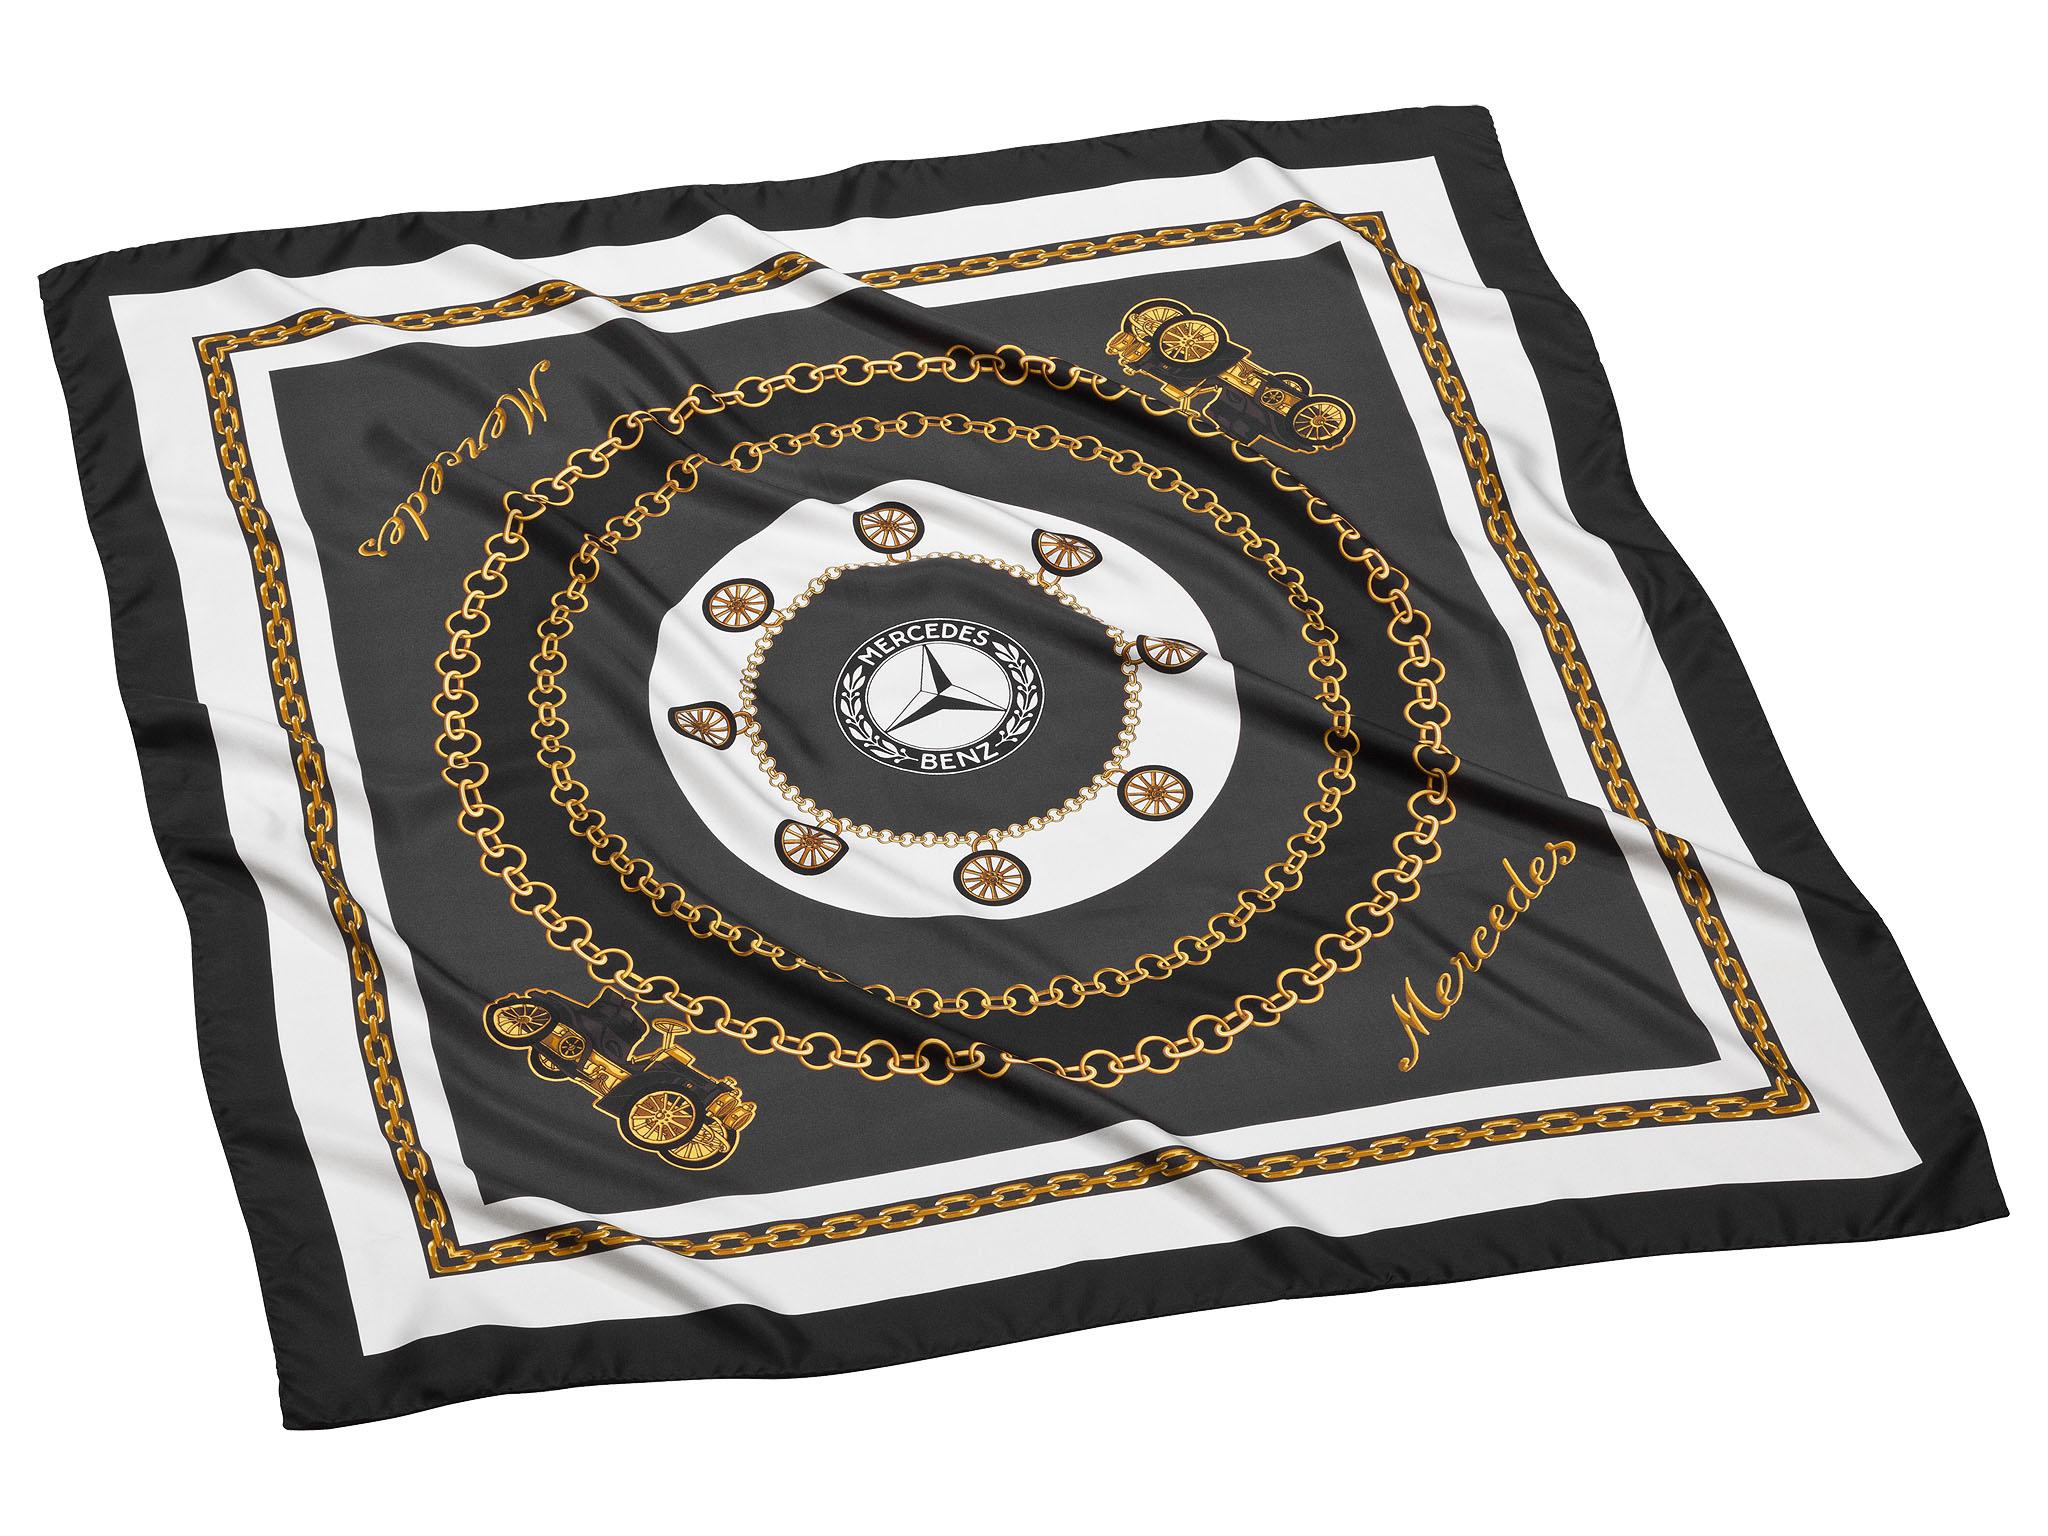 sjaal classic dames mercedes benz official online shop. Black Bedroom Furniture Sets. Home Design Ideas